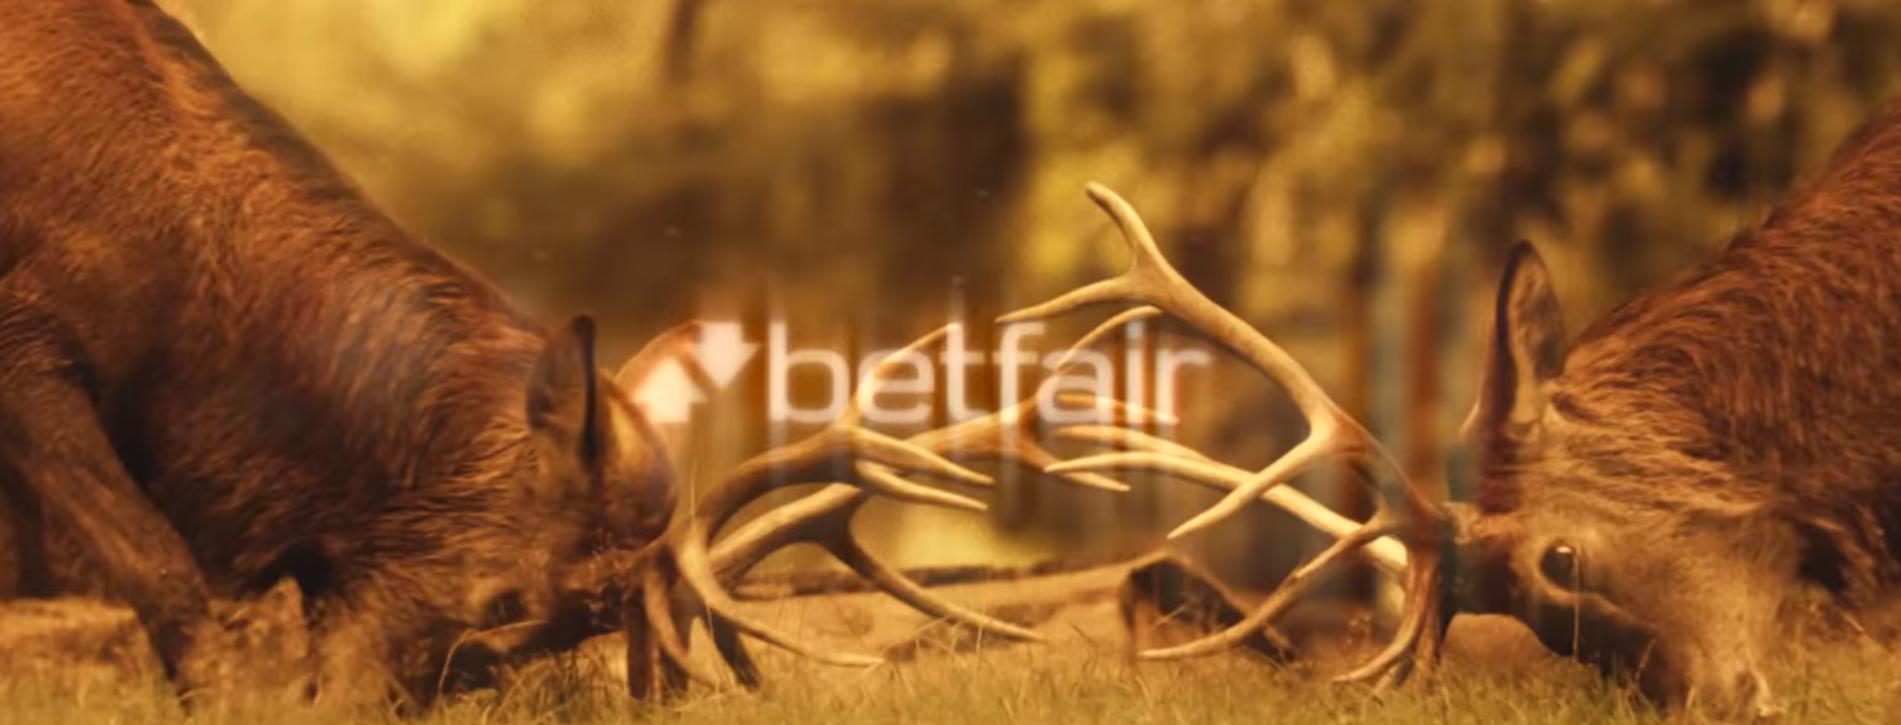 Ready? Exchange Betfair